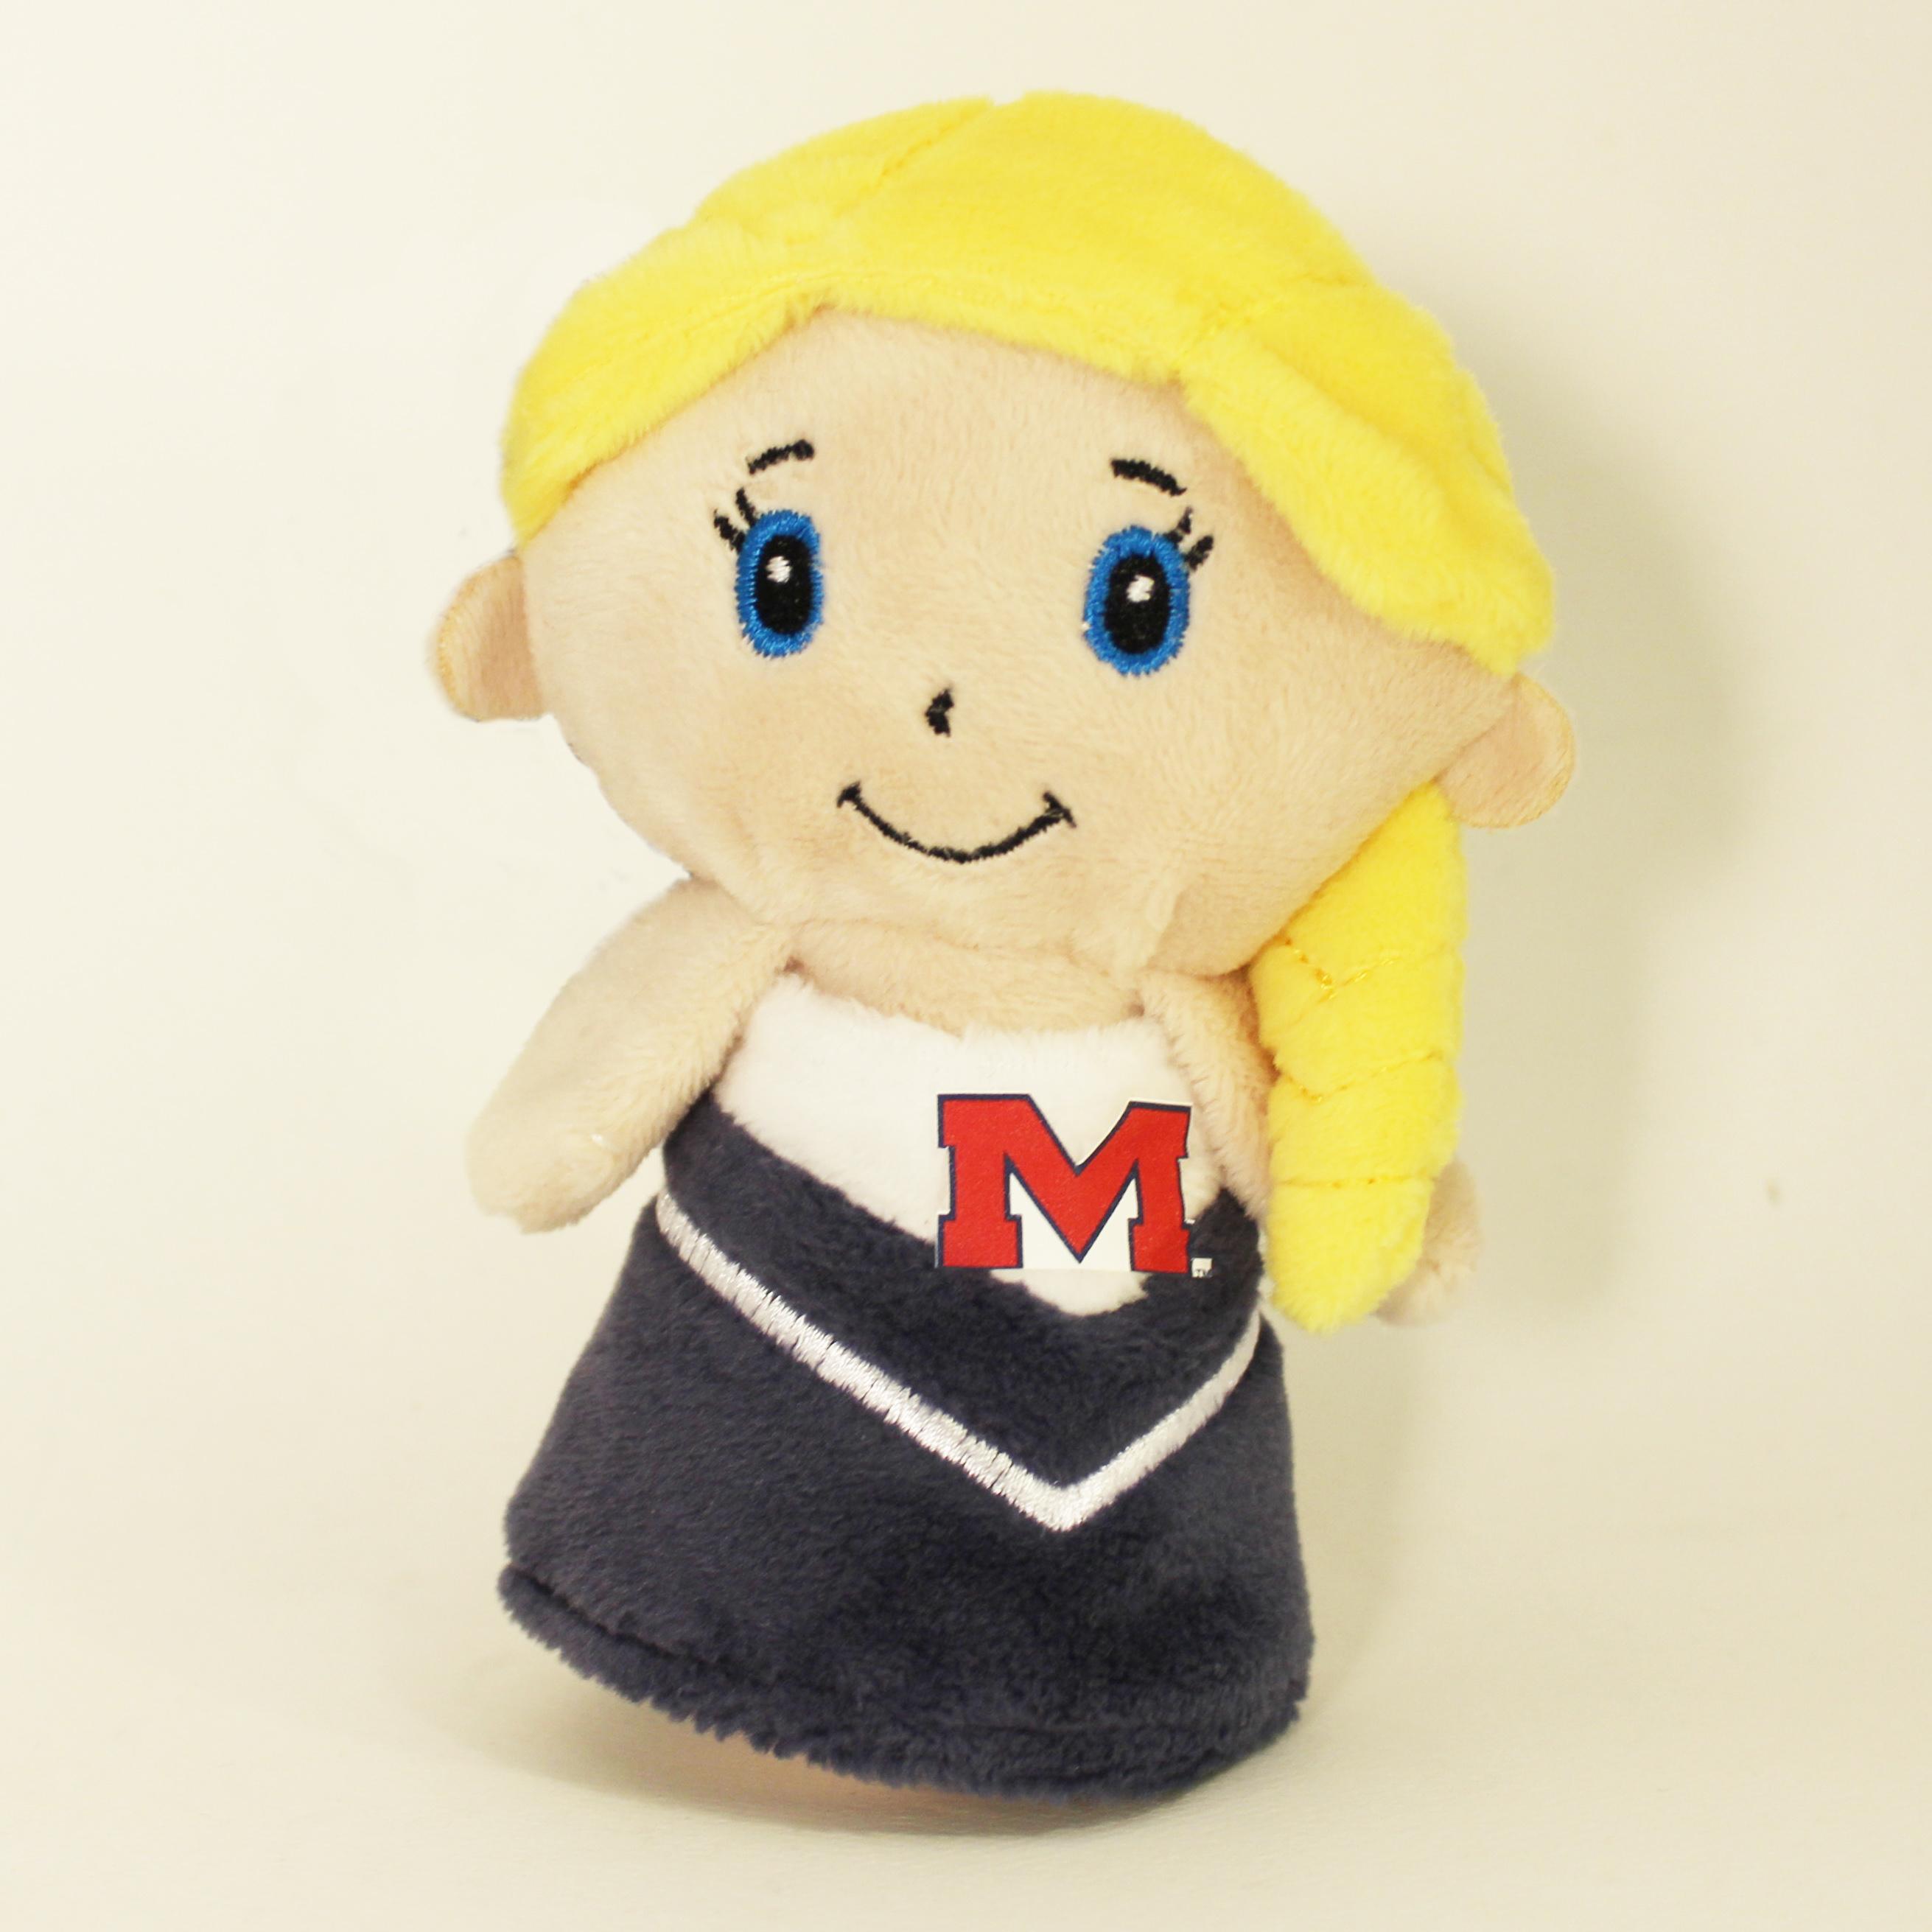 Cheerleader Tiny Tot Mini Plush